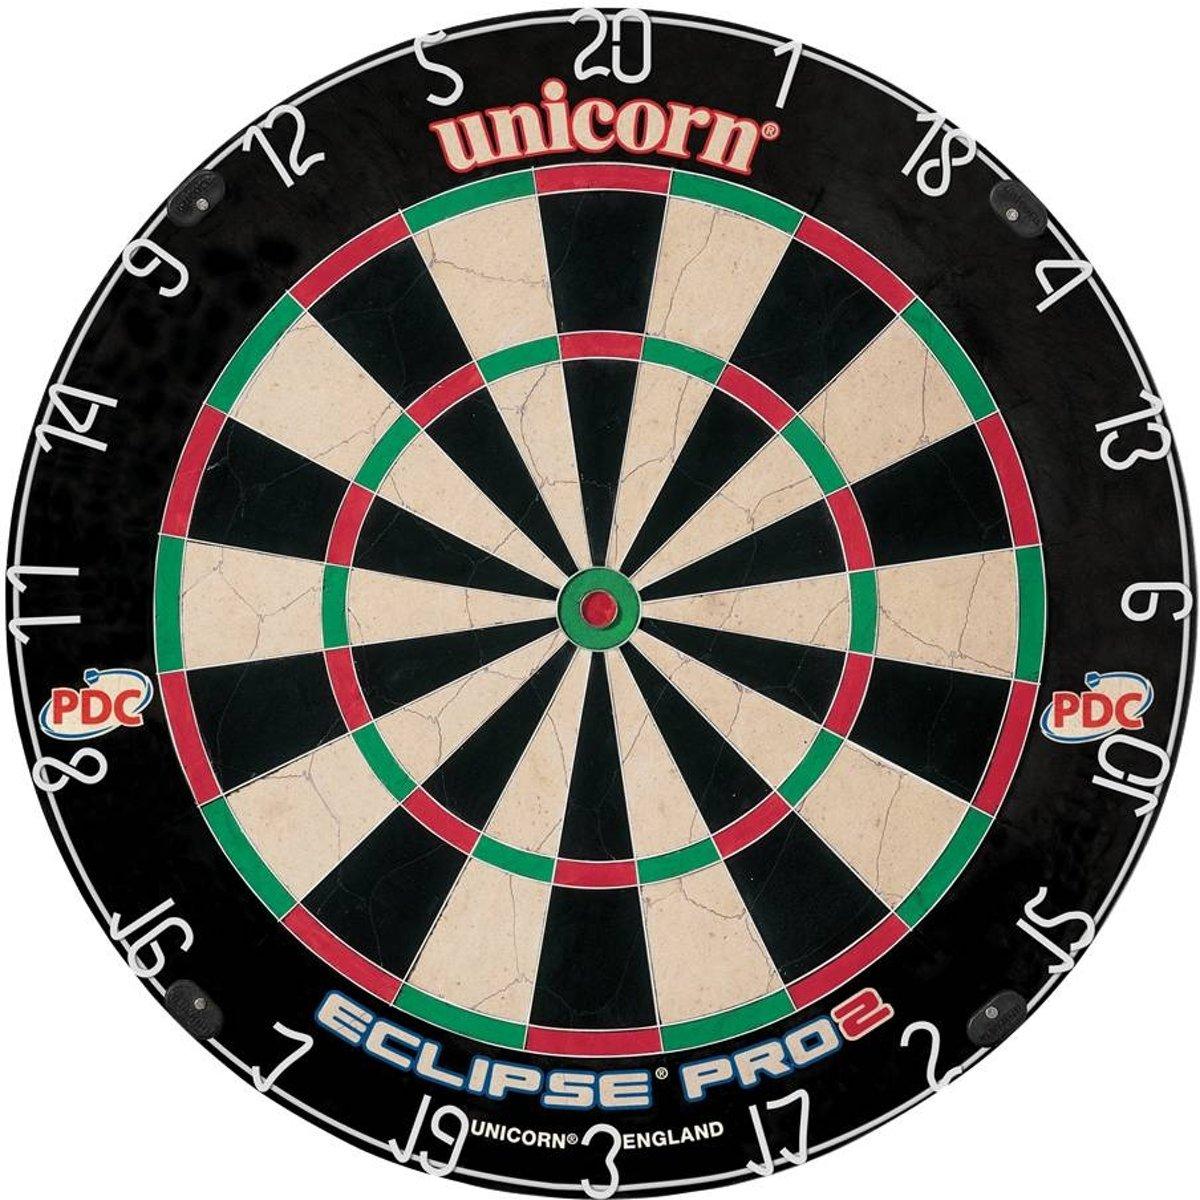 Unicorn Eclipse Pro 2 - Dartbord kopen